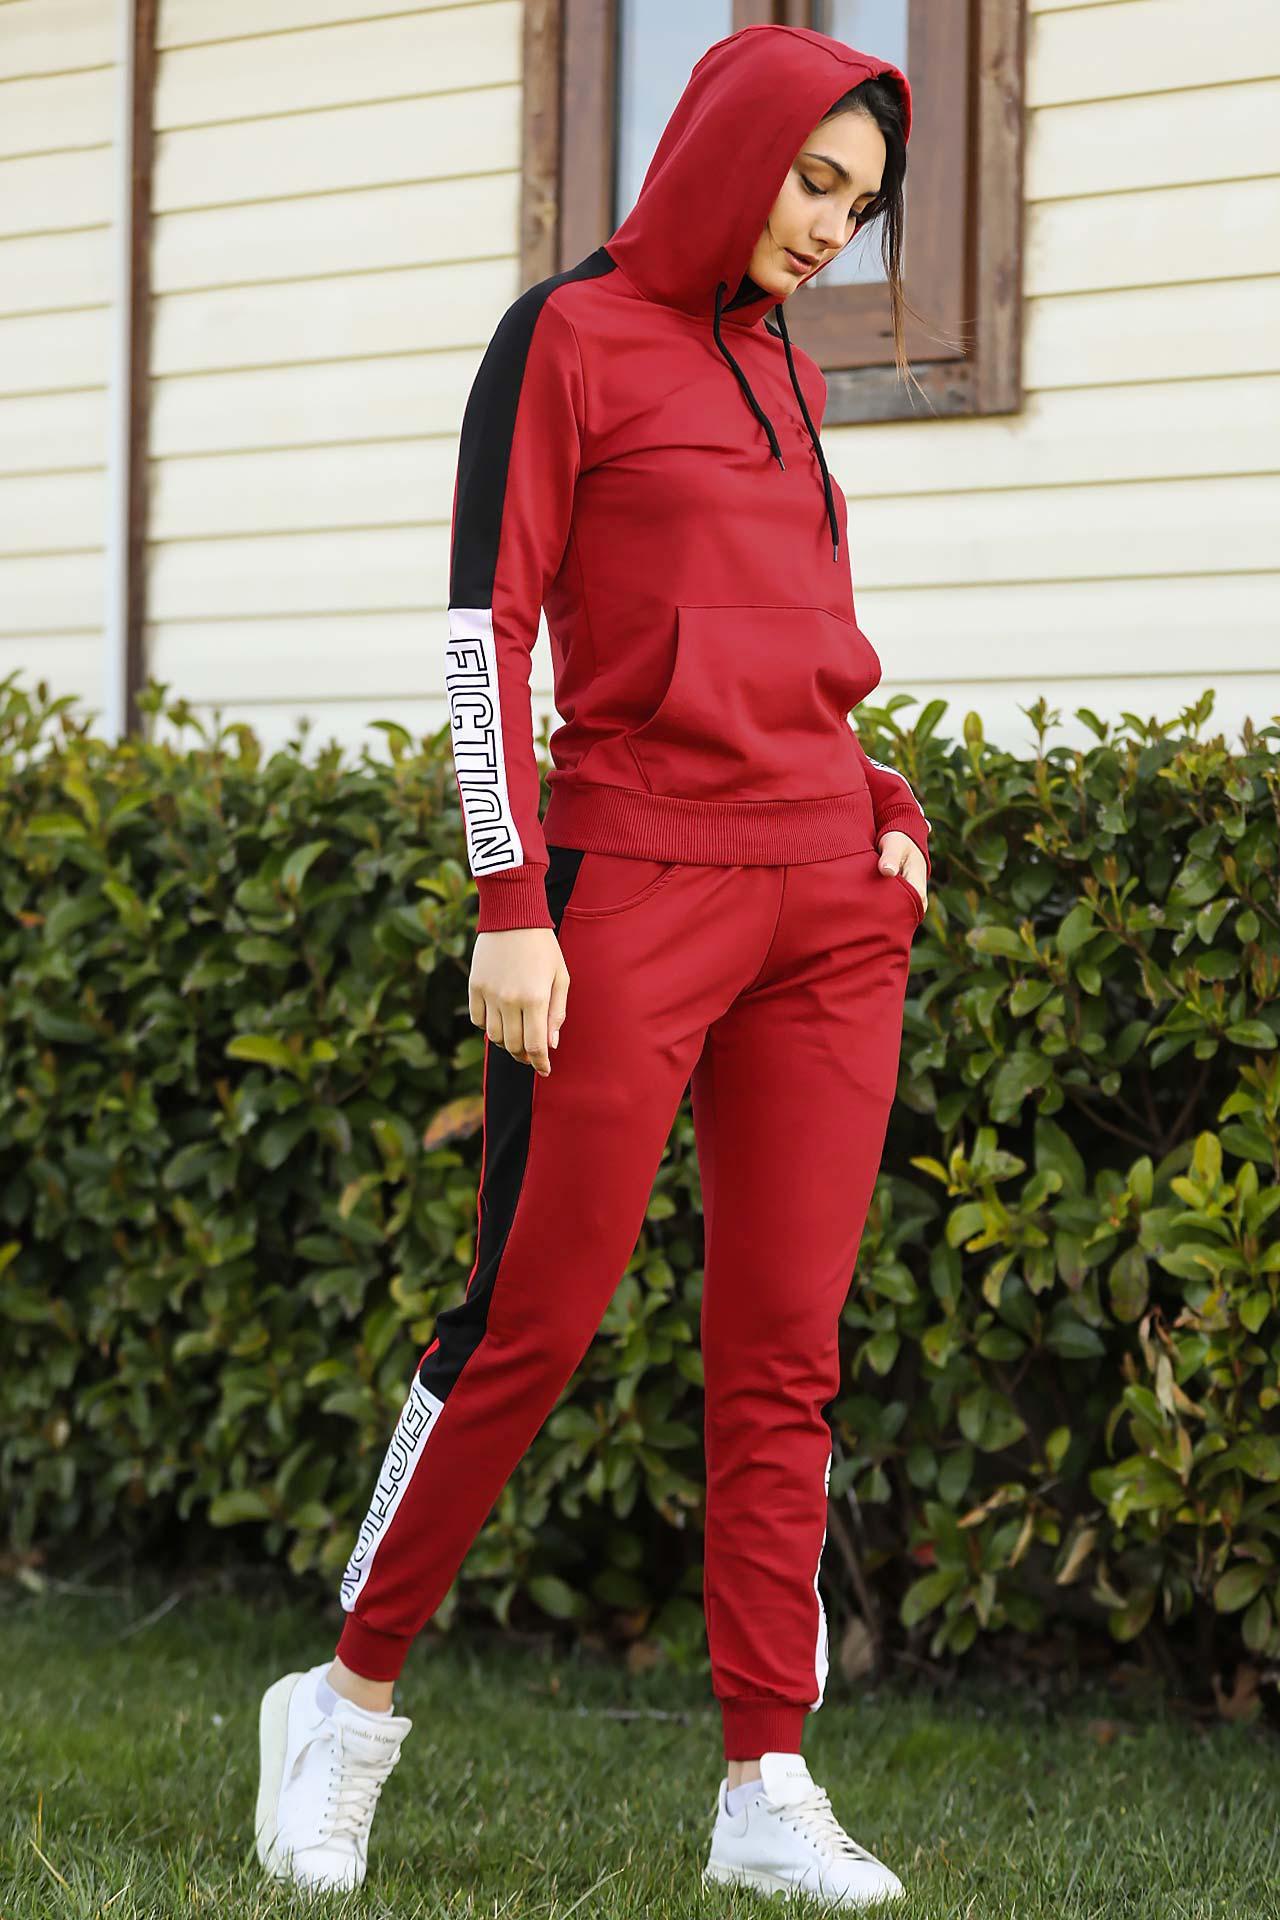 Women's Hooded Red Sweat Suit